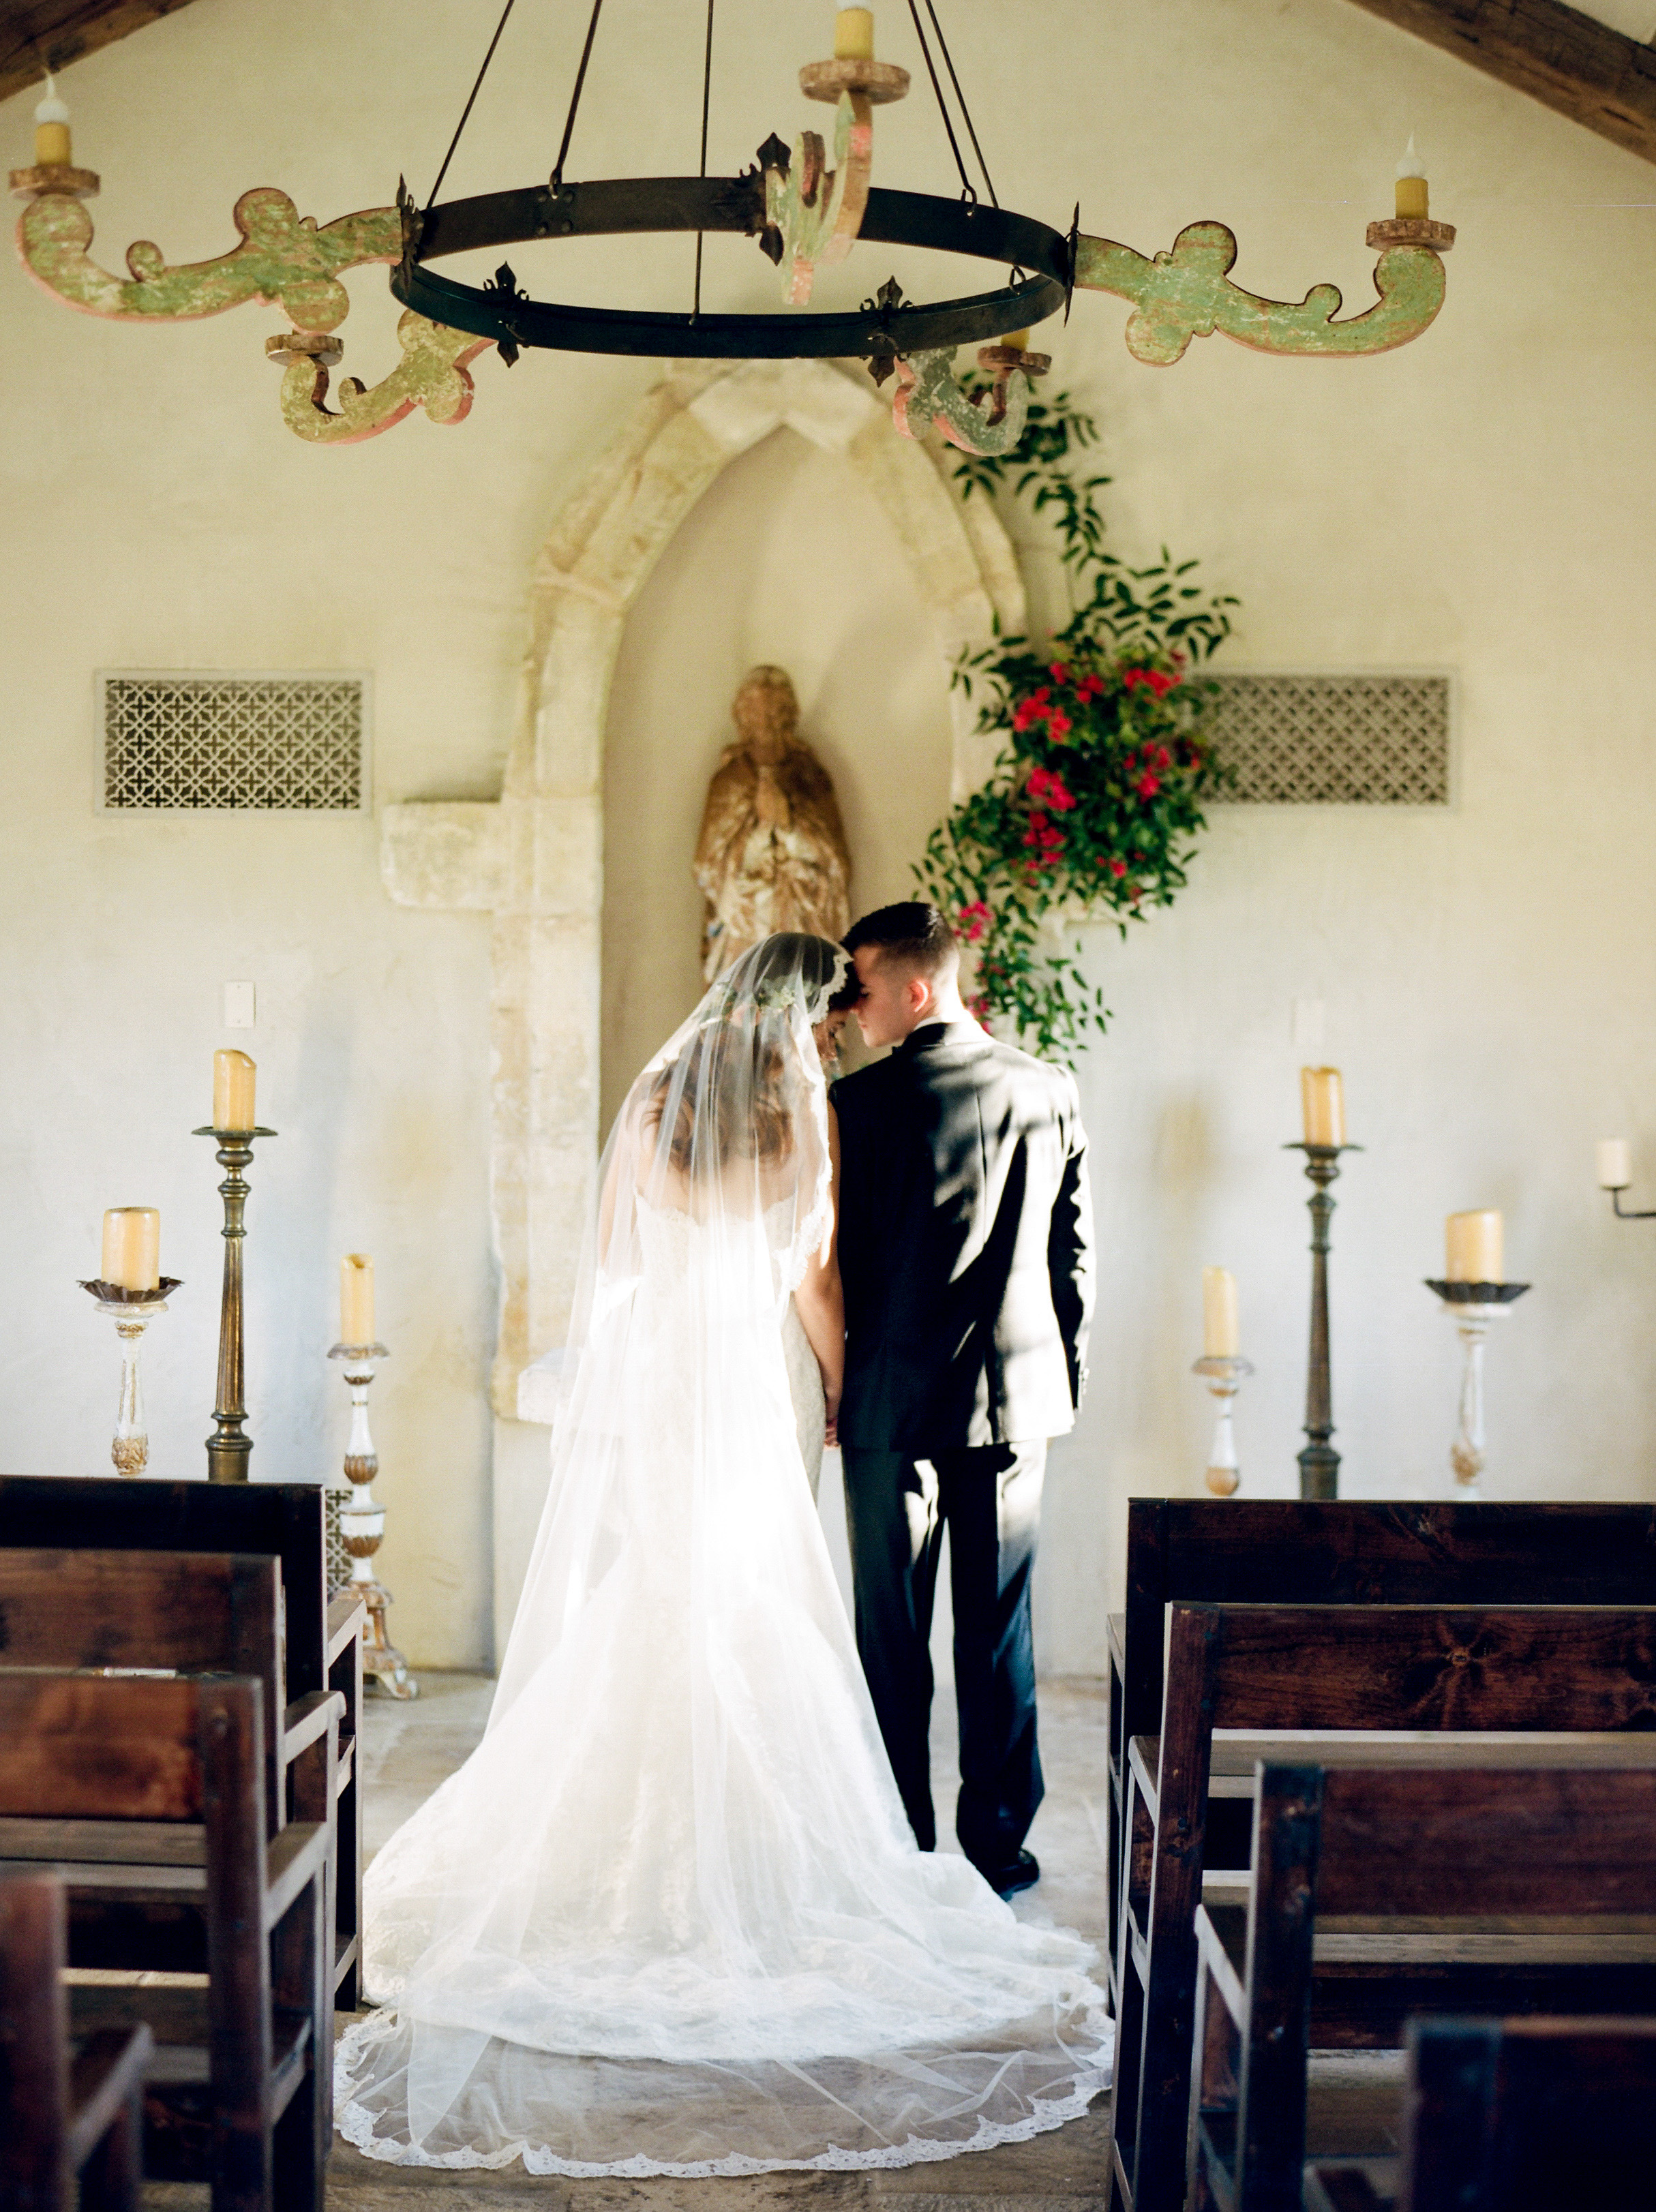 Top-Houston-Wedding-Photographer-Dana-Fernandez-Photography-The-Clubs-At-Houston-Oaks-Country-Club-Belle-Events-Film-Fine-Art-Destination-14.jpg